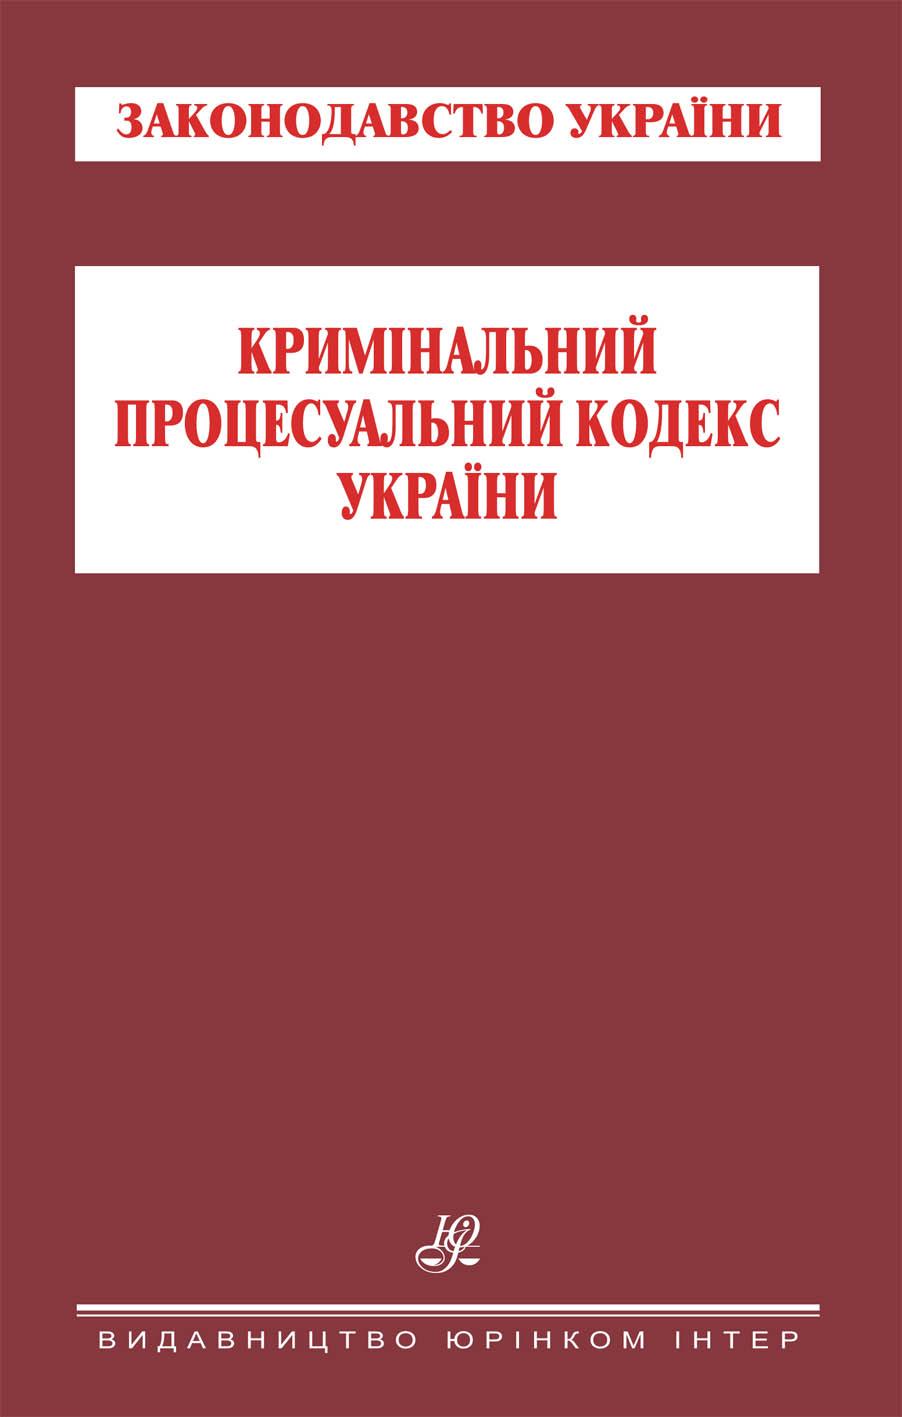 Обложка книги Кримінальний процесуальний кодекс.